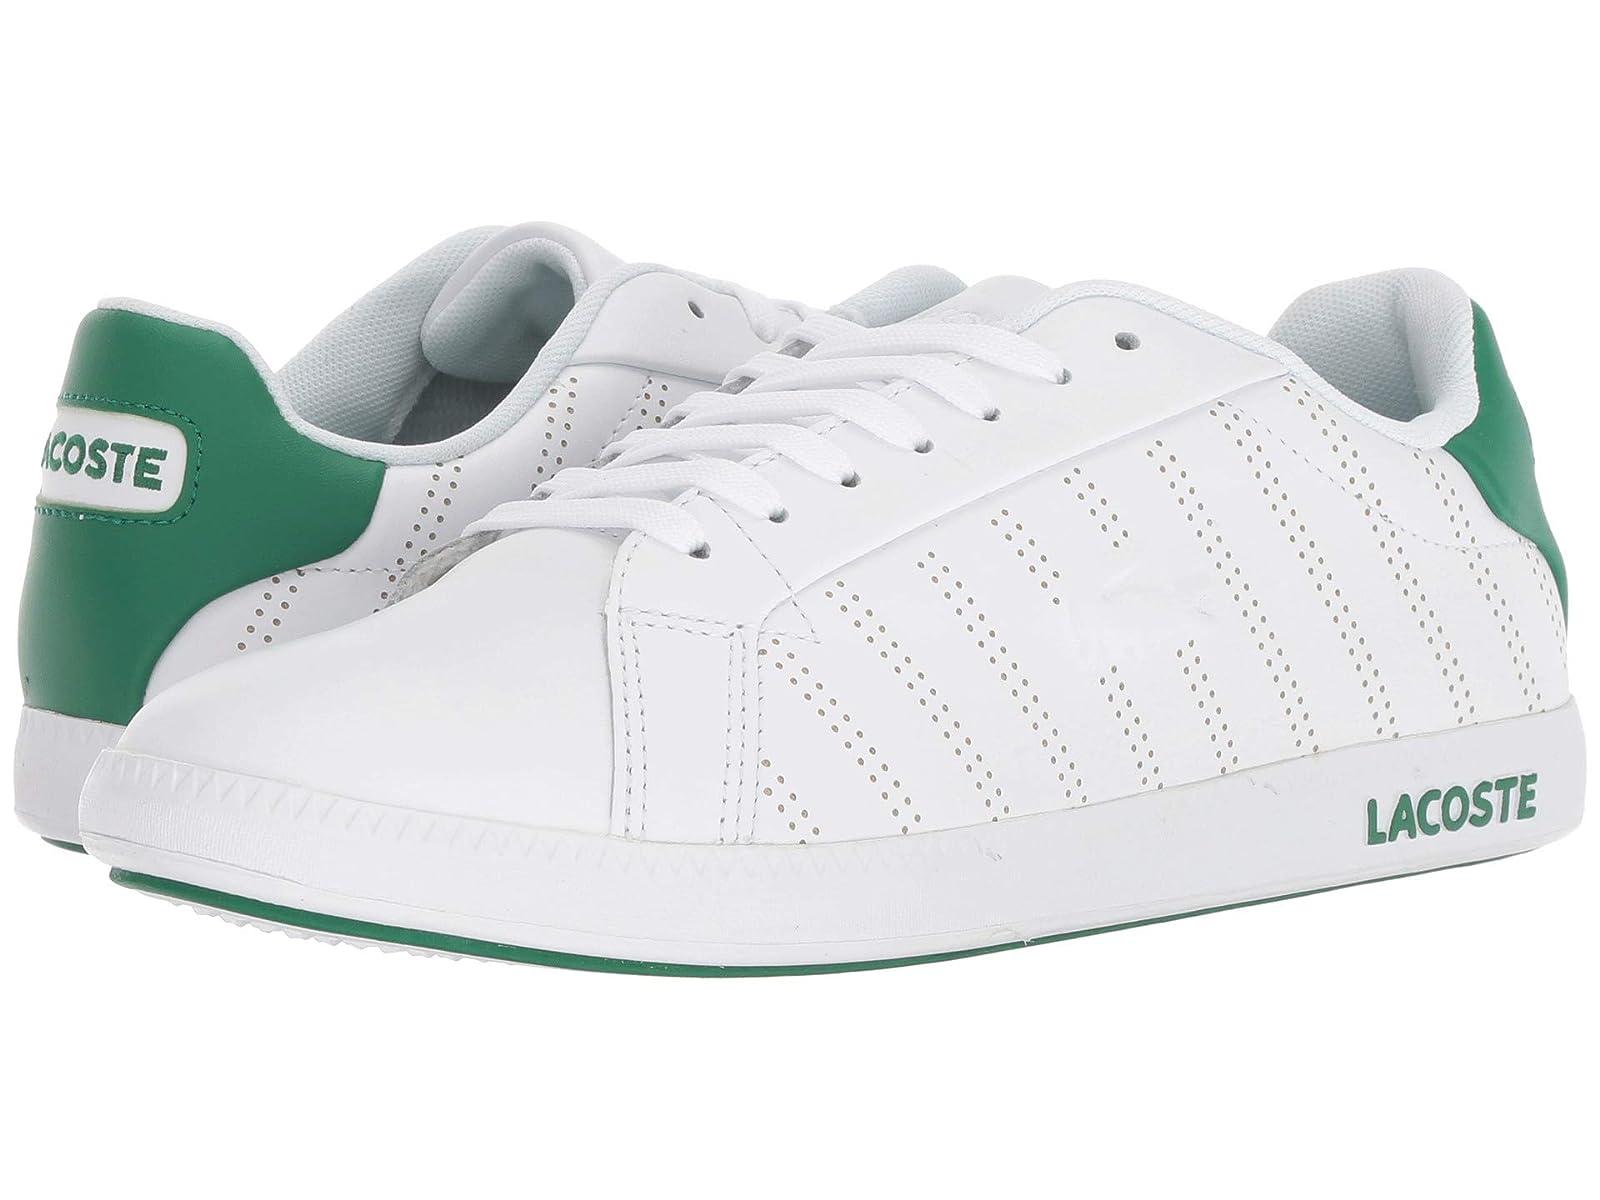 Lacoste Graduate 318 1Atmospheric grades have affordable shoes